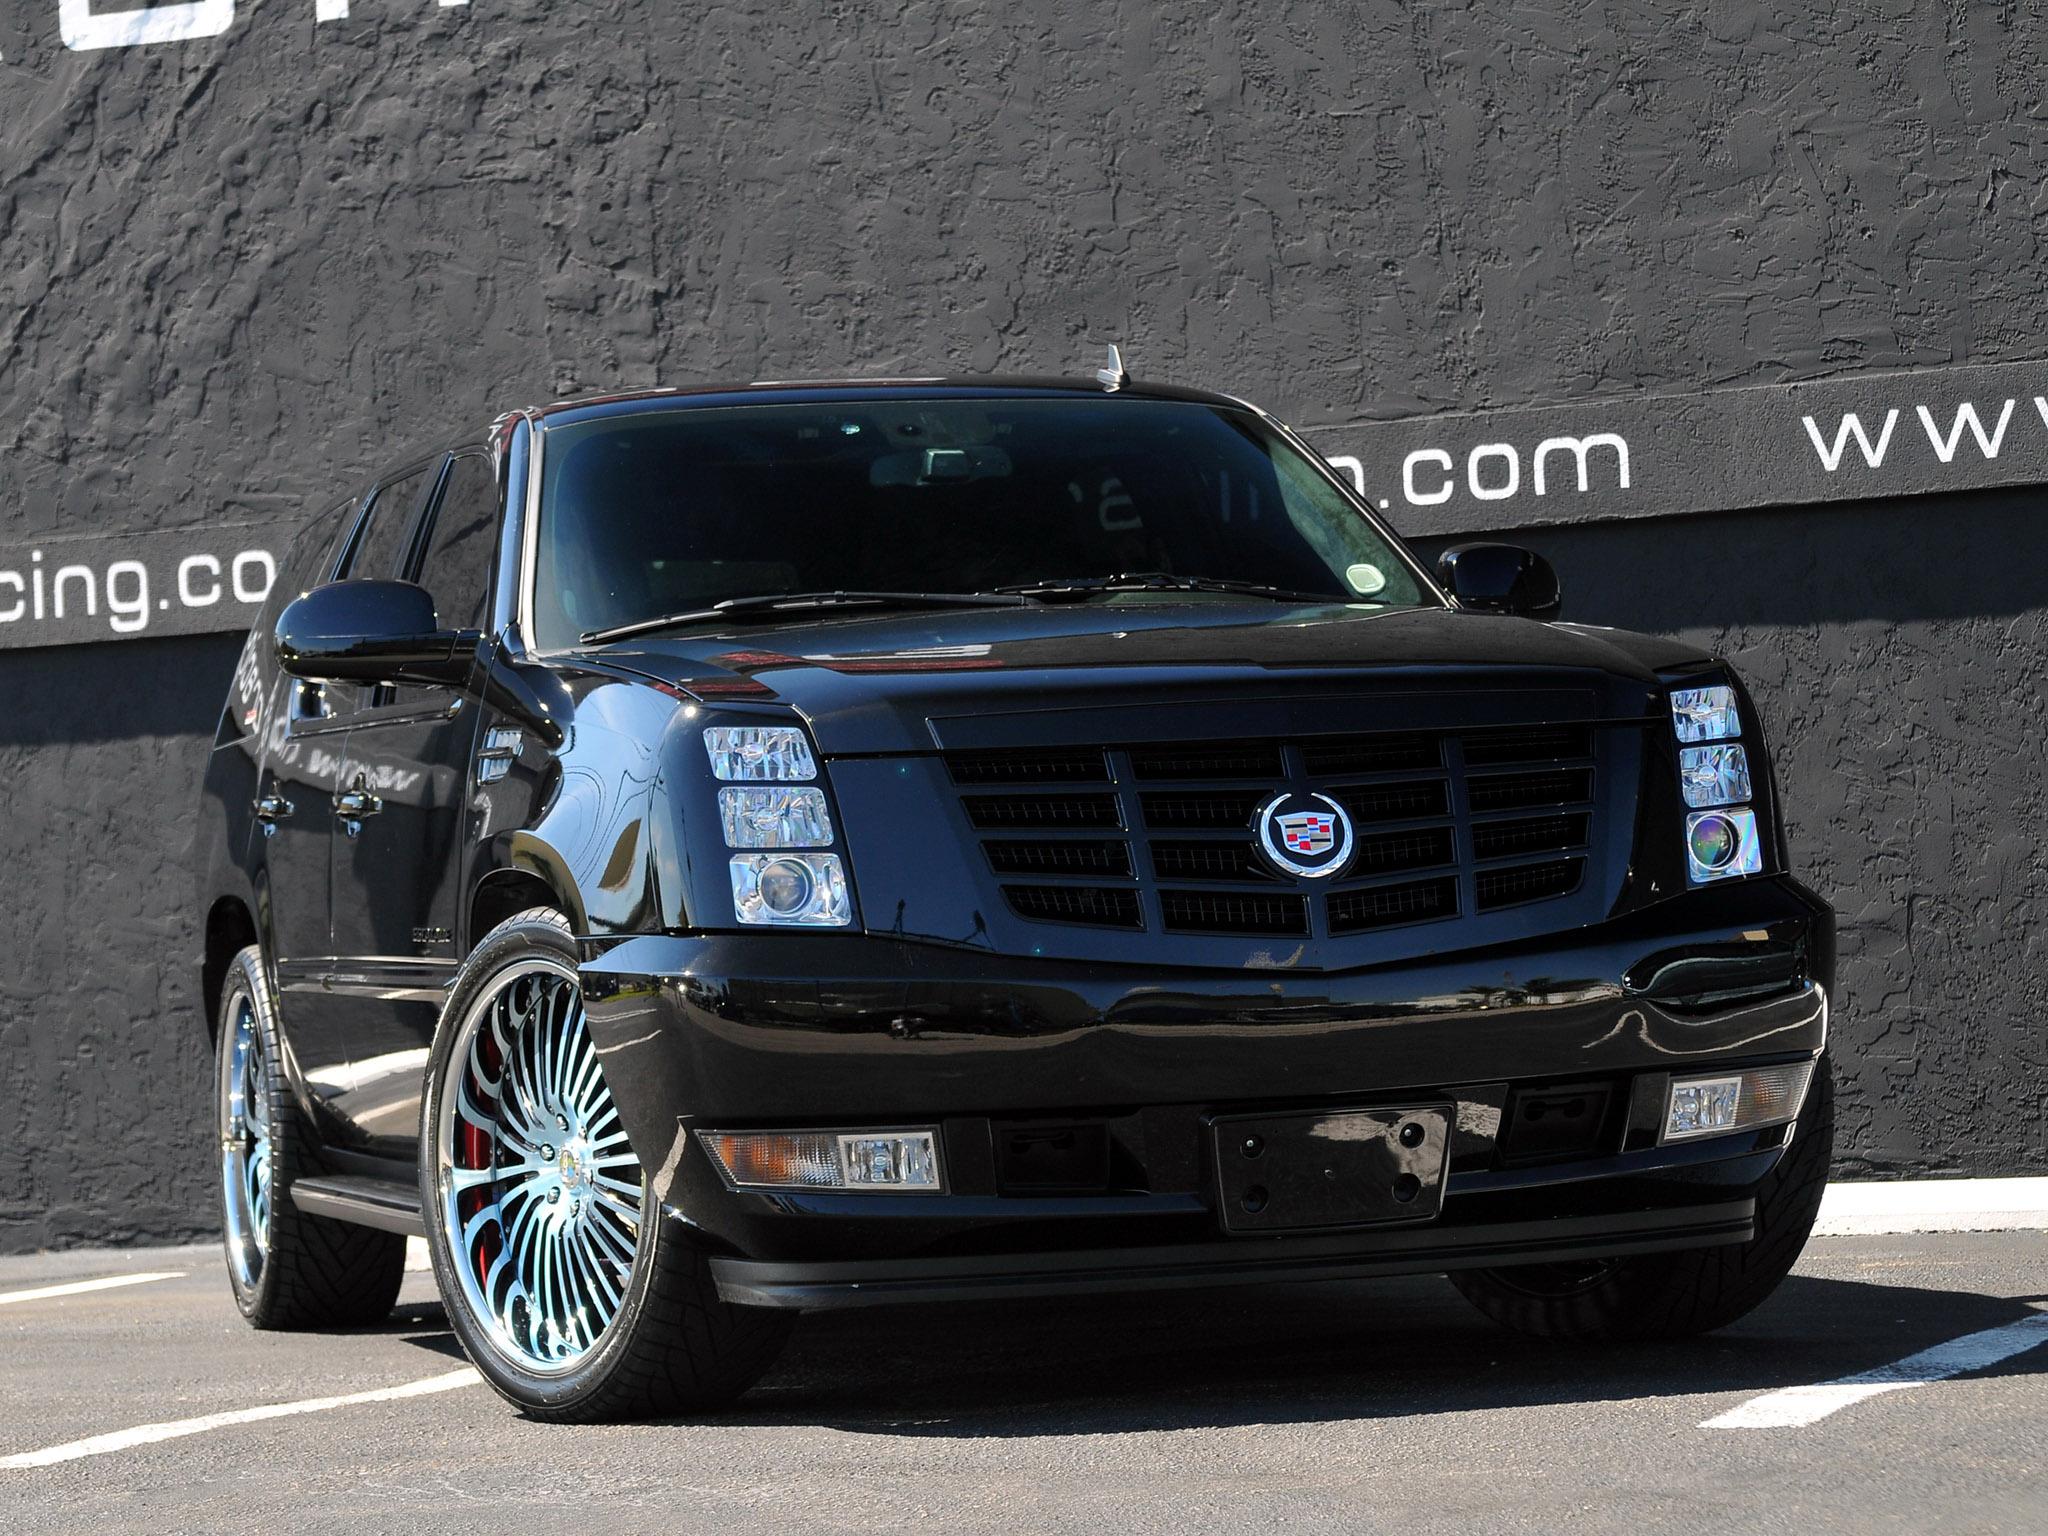 2010 MCP Racing Cadillac Escalade suv tuning luxury wallpaper 2048x1536